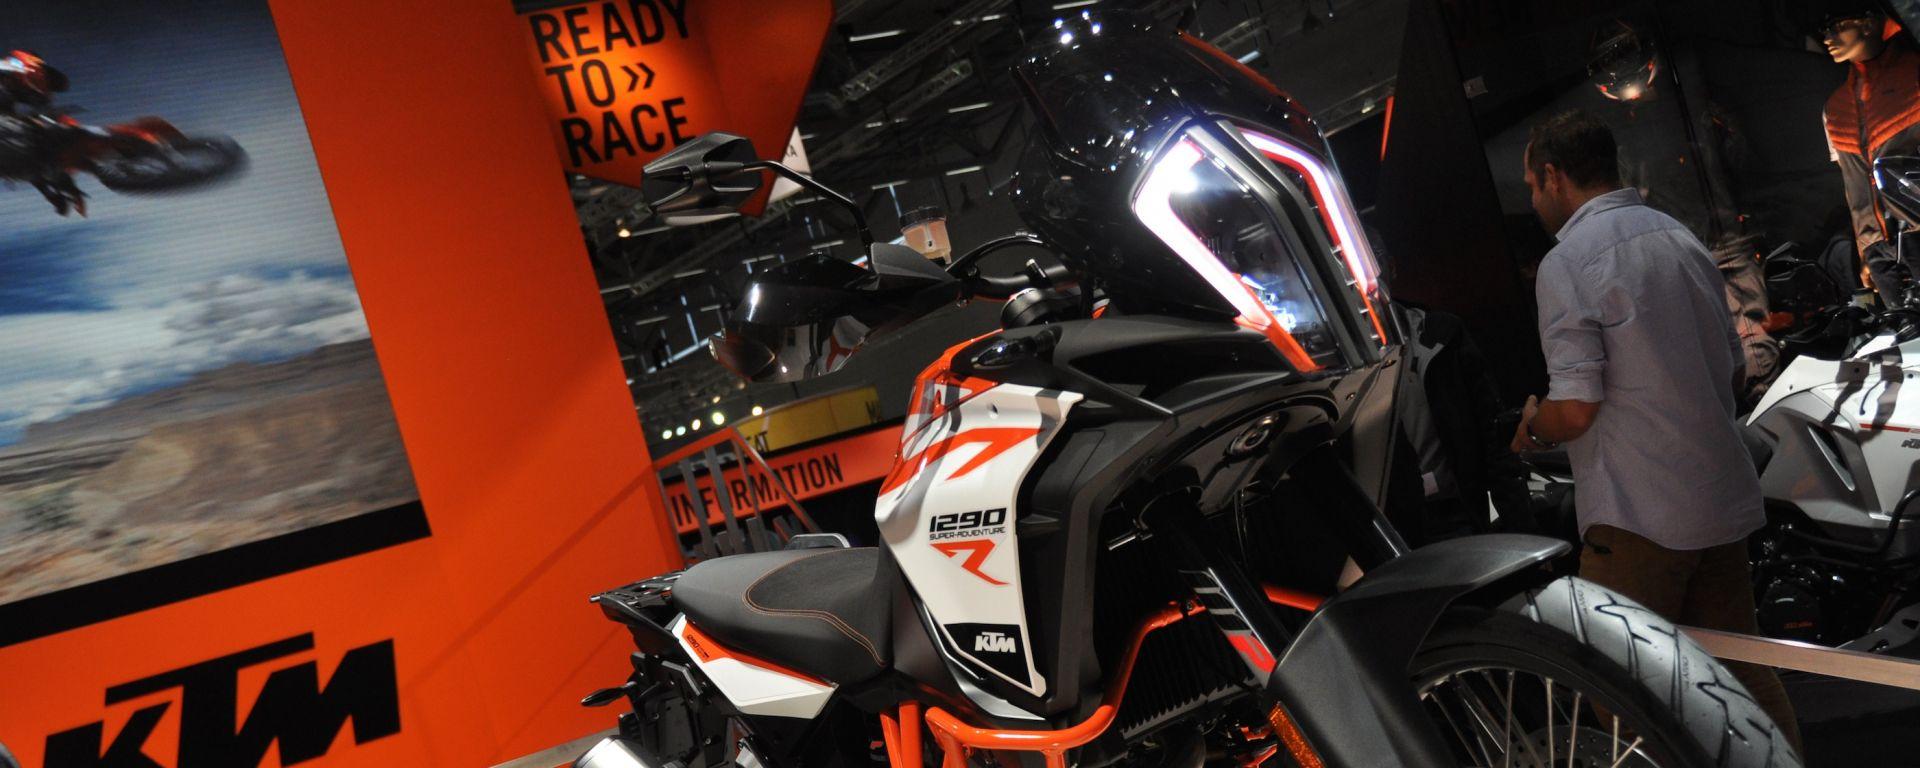 KTM 1290 Super Adventure R, S e T, le ammiraglie arancioni